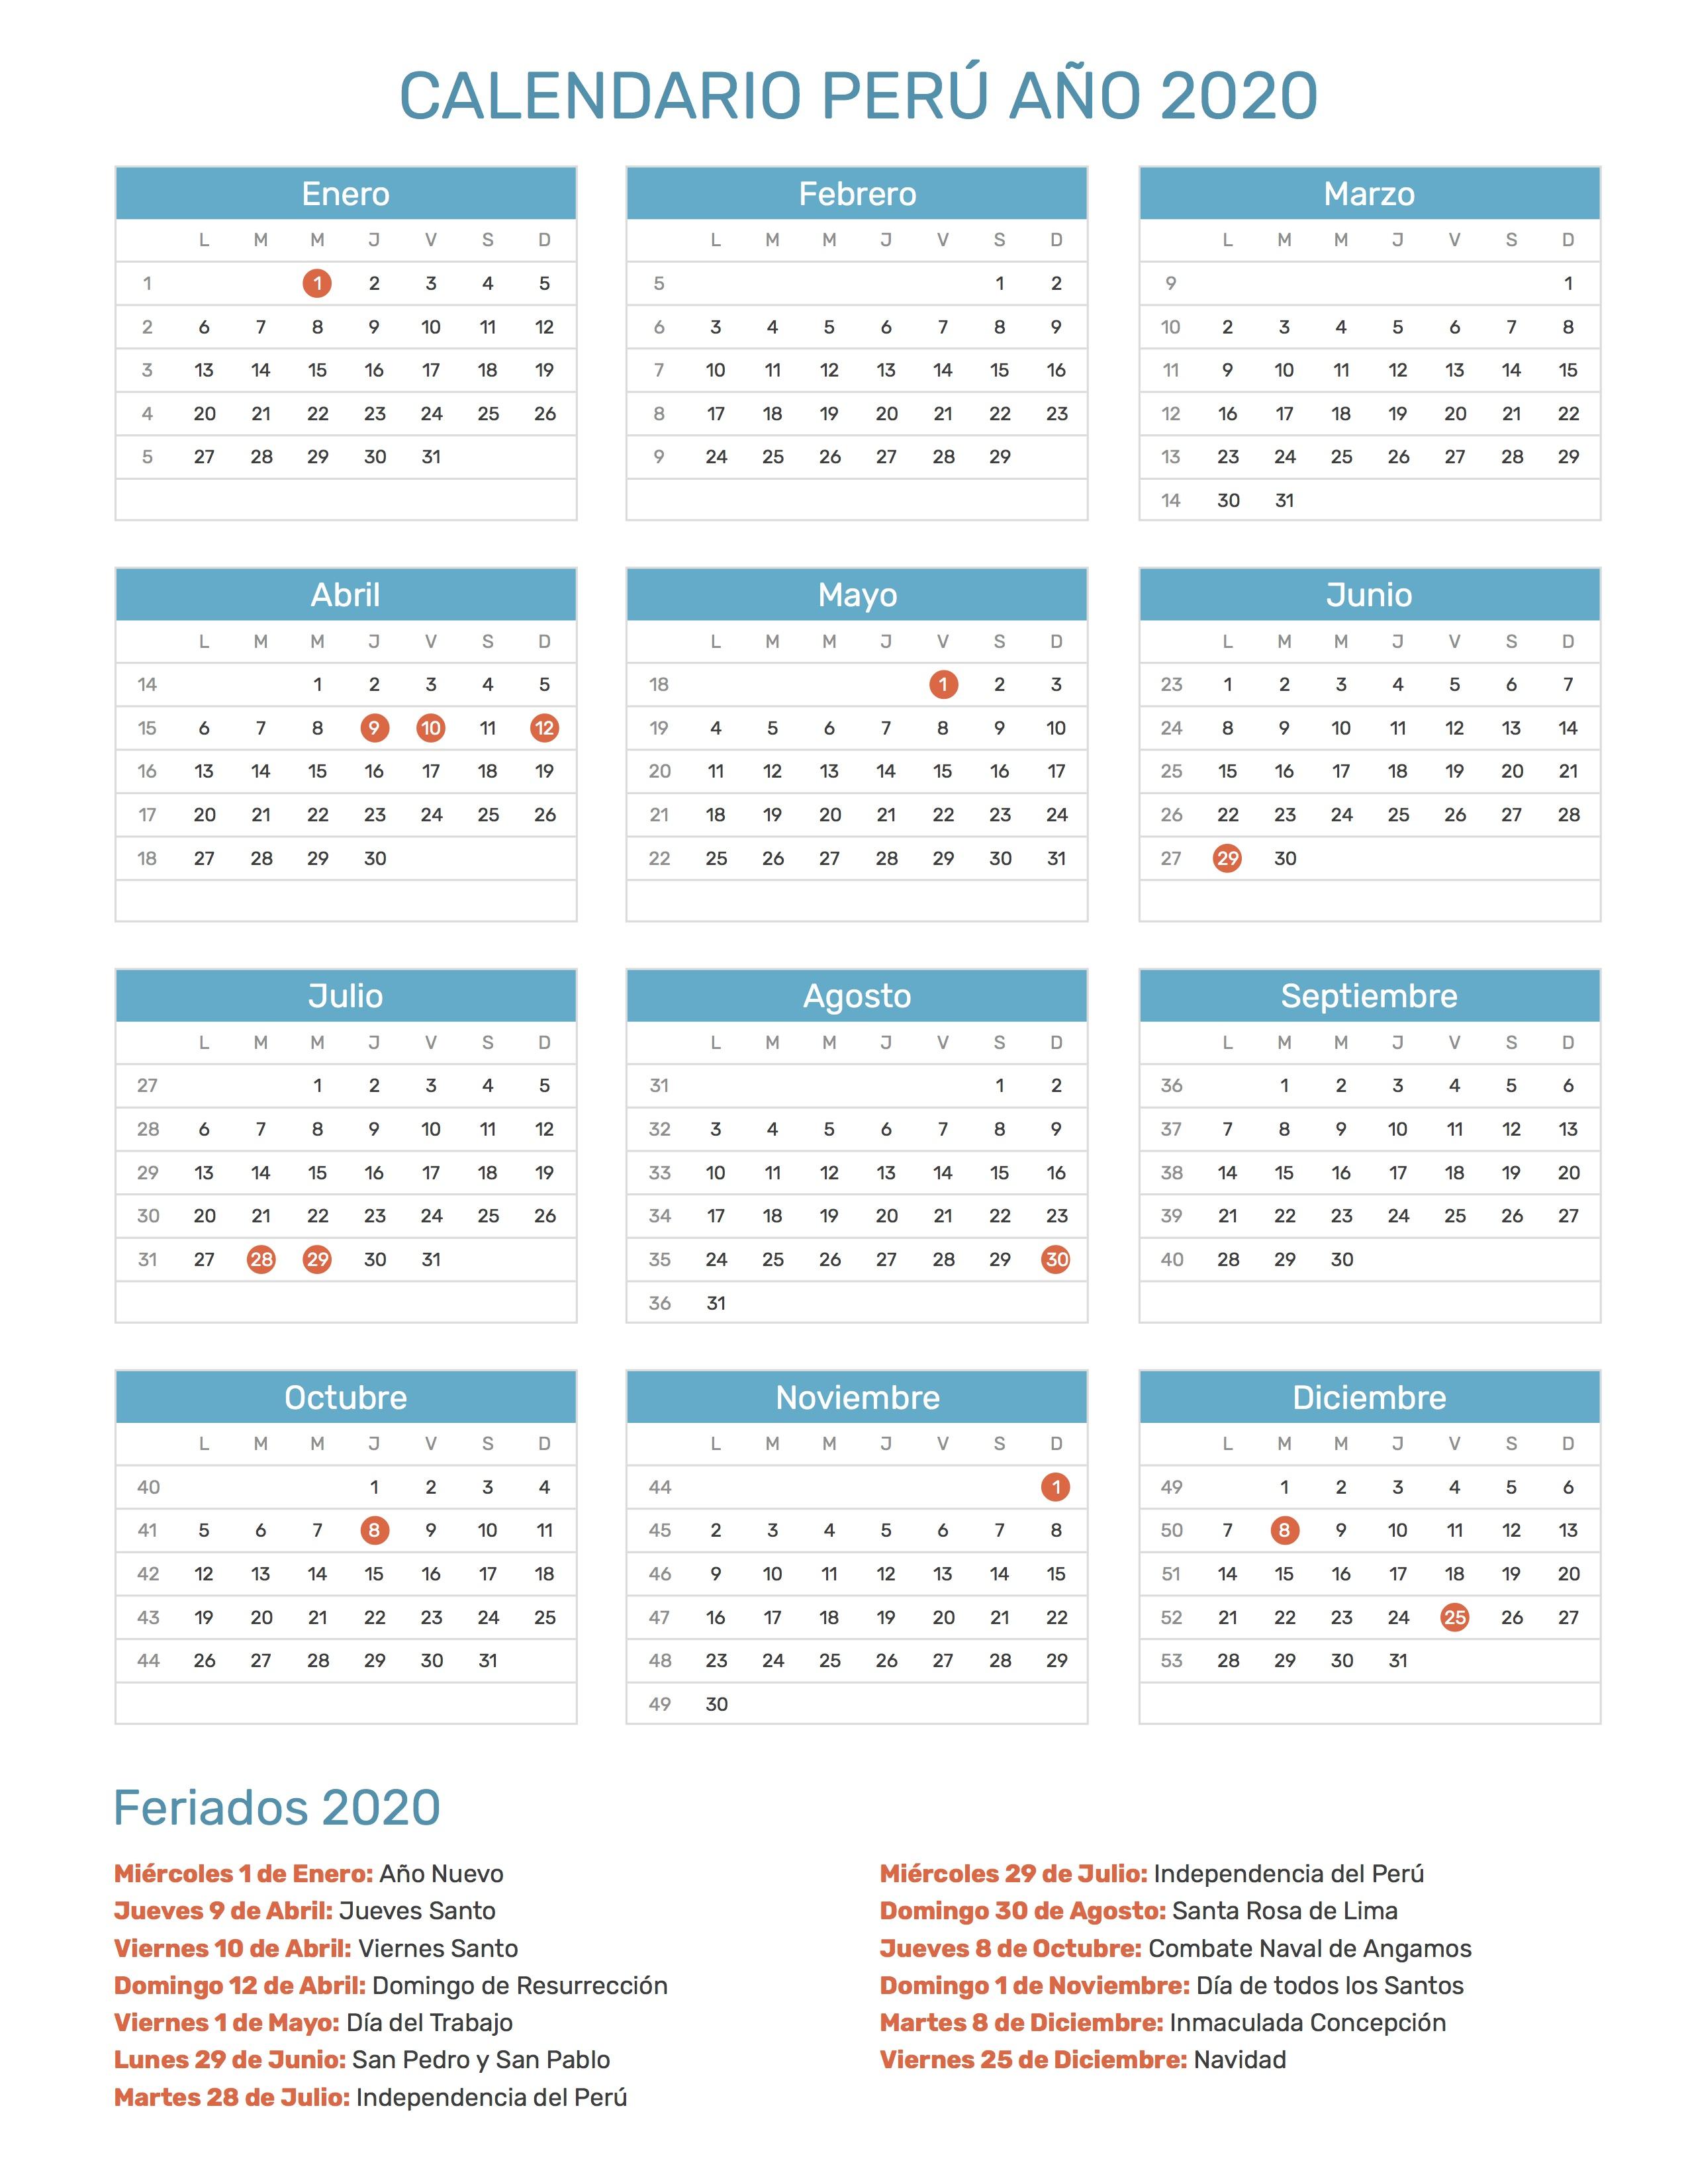 Calendario Marzo 2020 Peru.Calendario De Peru Ano 2020 Feriados